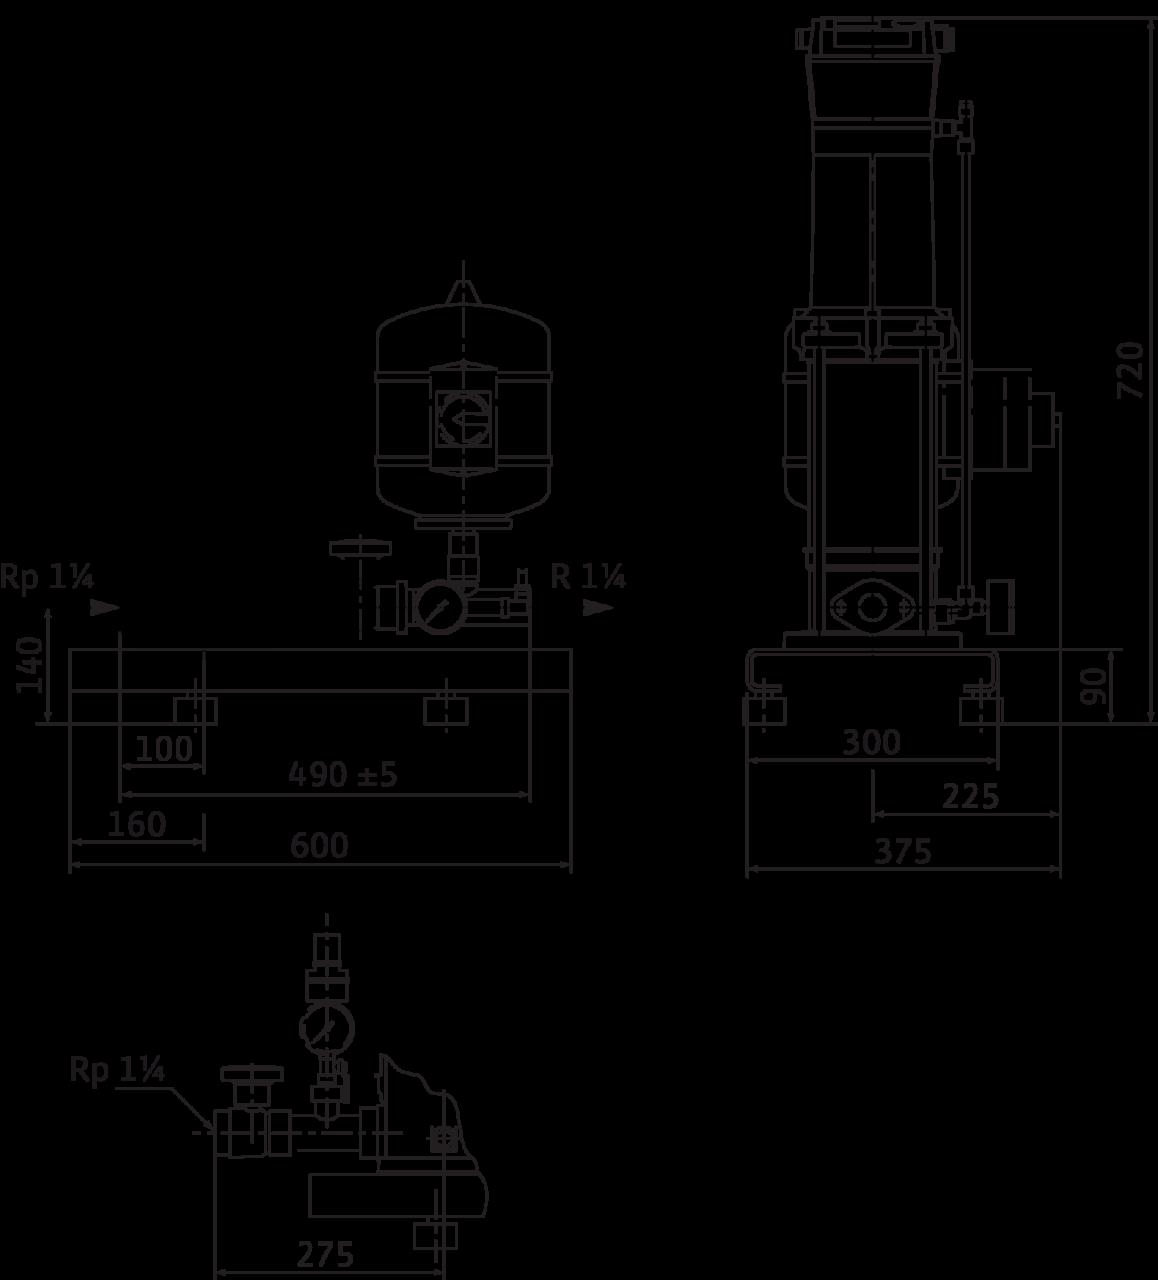 Comfort N Vario Cor 1 Mvise 206 Ge Wilo 300 Line Control Wiring Diagram 2526718 Congraph 410 2g Dim 02 0912